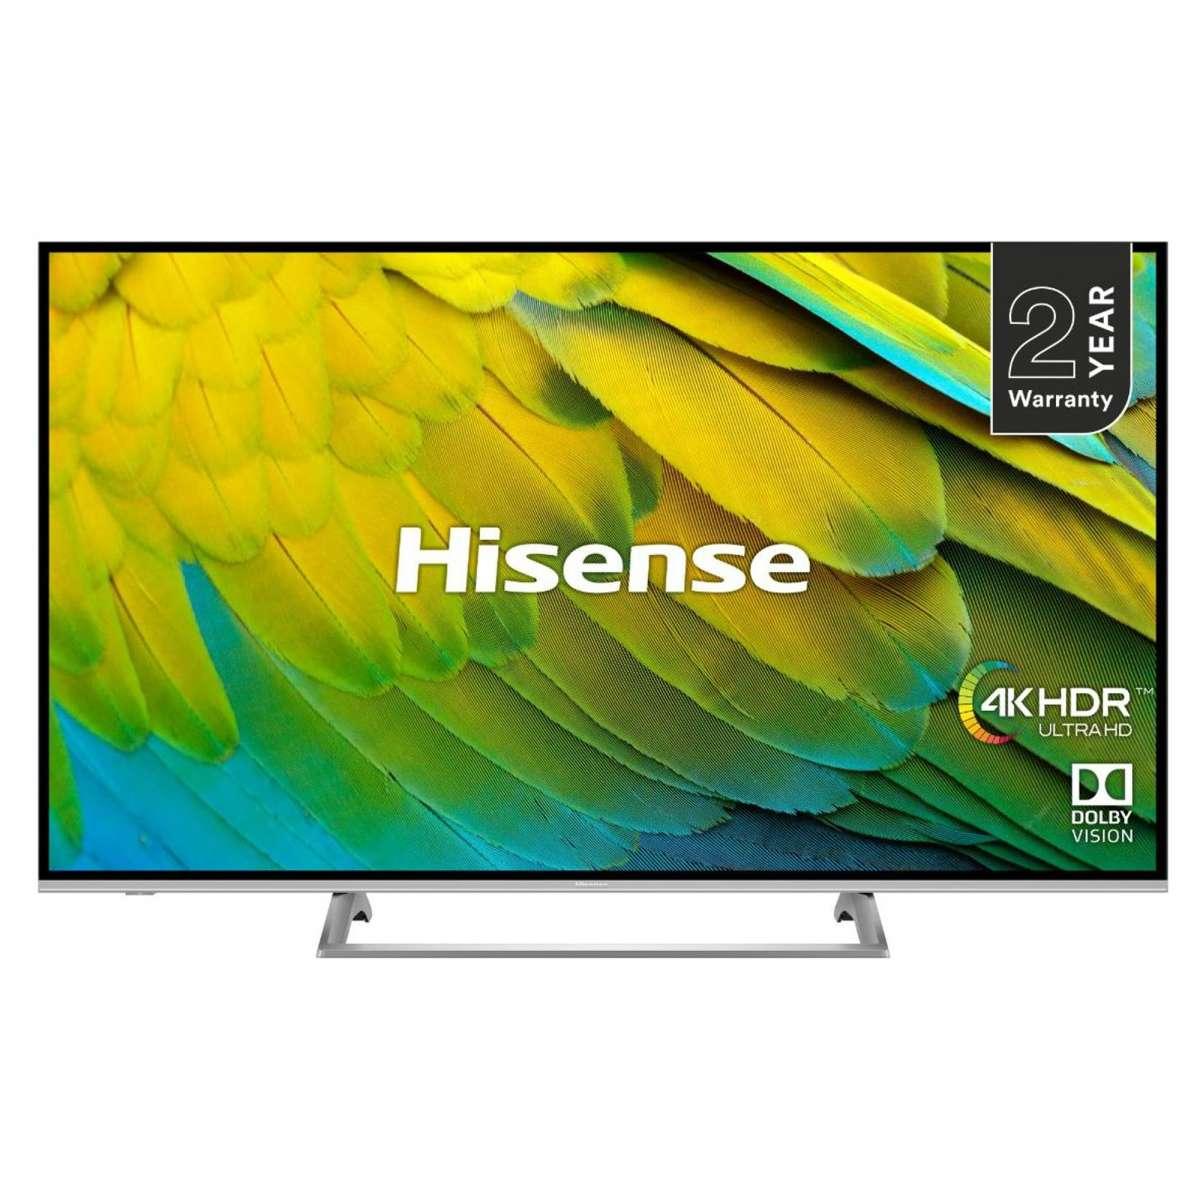 Hisense 65B7500UK 65 inch 4K Ultra HD HDR Smart LED TV Freeview Play - £624 using code @ Hughes / eBay